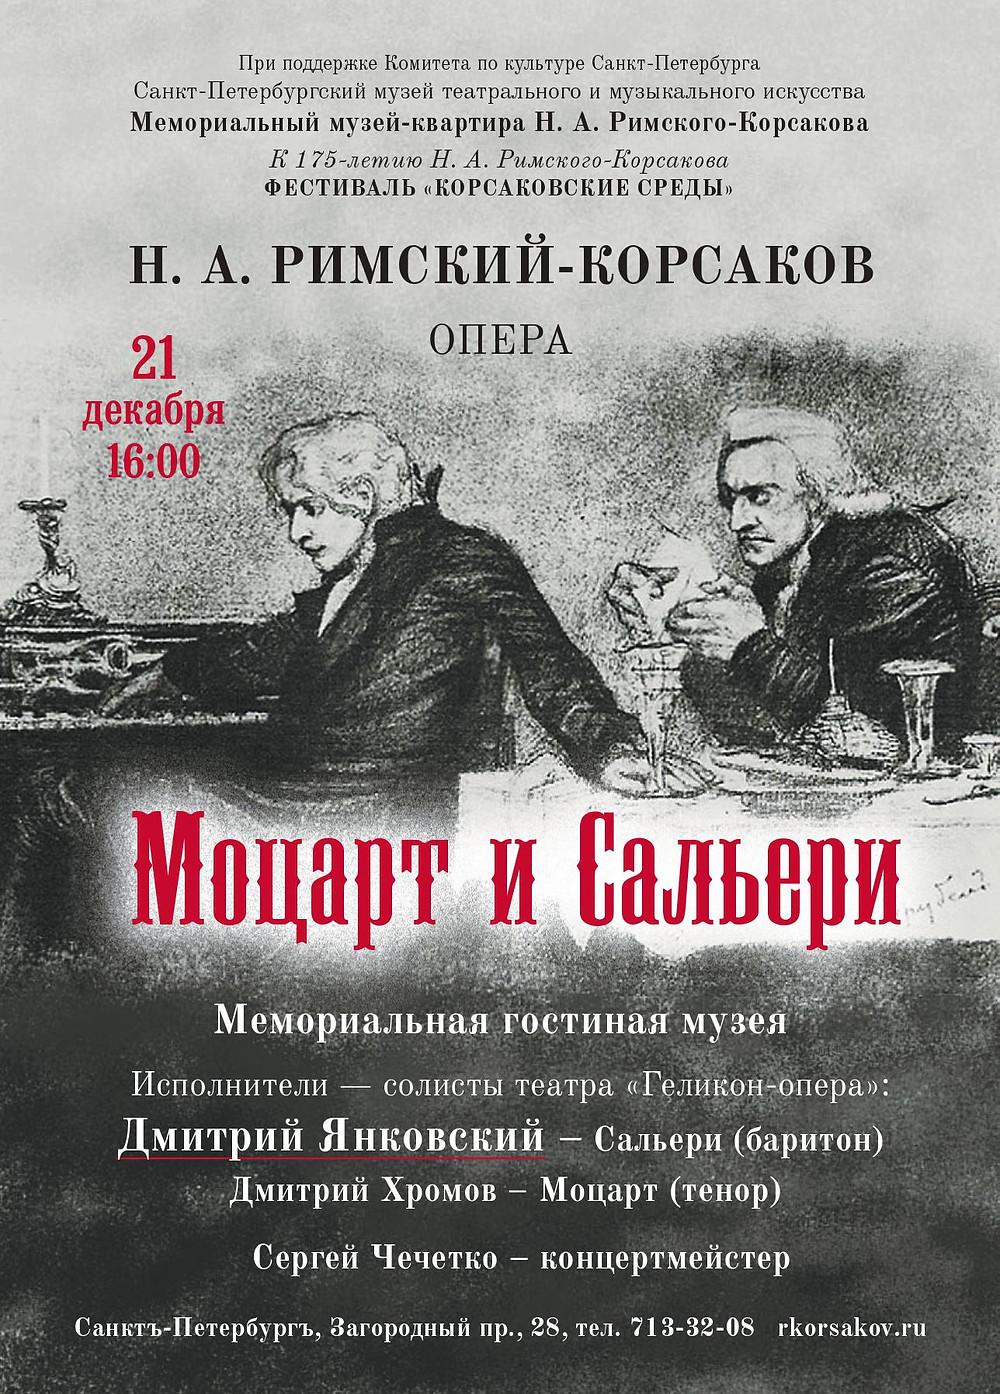 Дмитрий Янковский опера Моцарт и Сальери